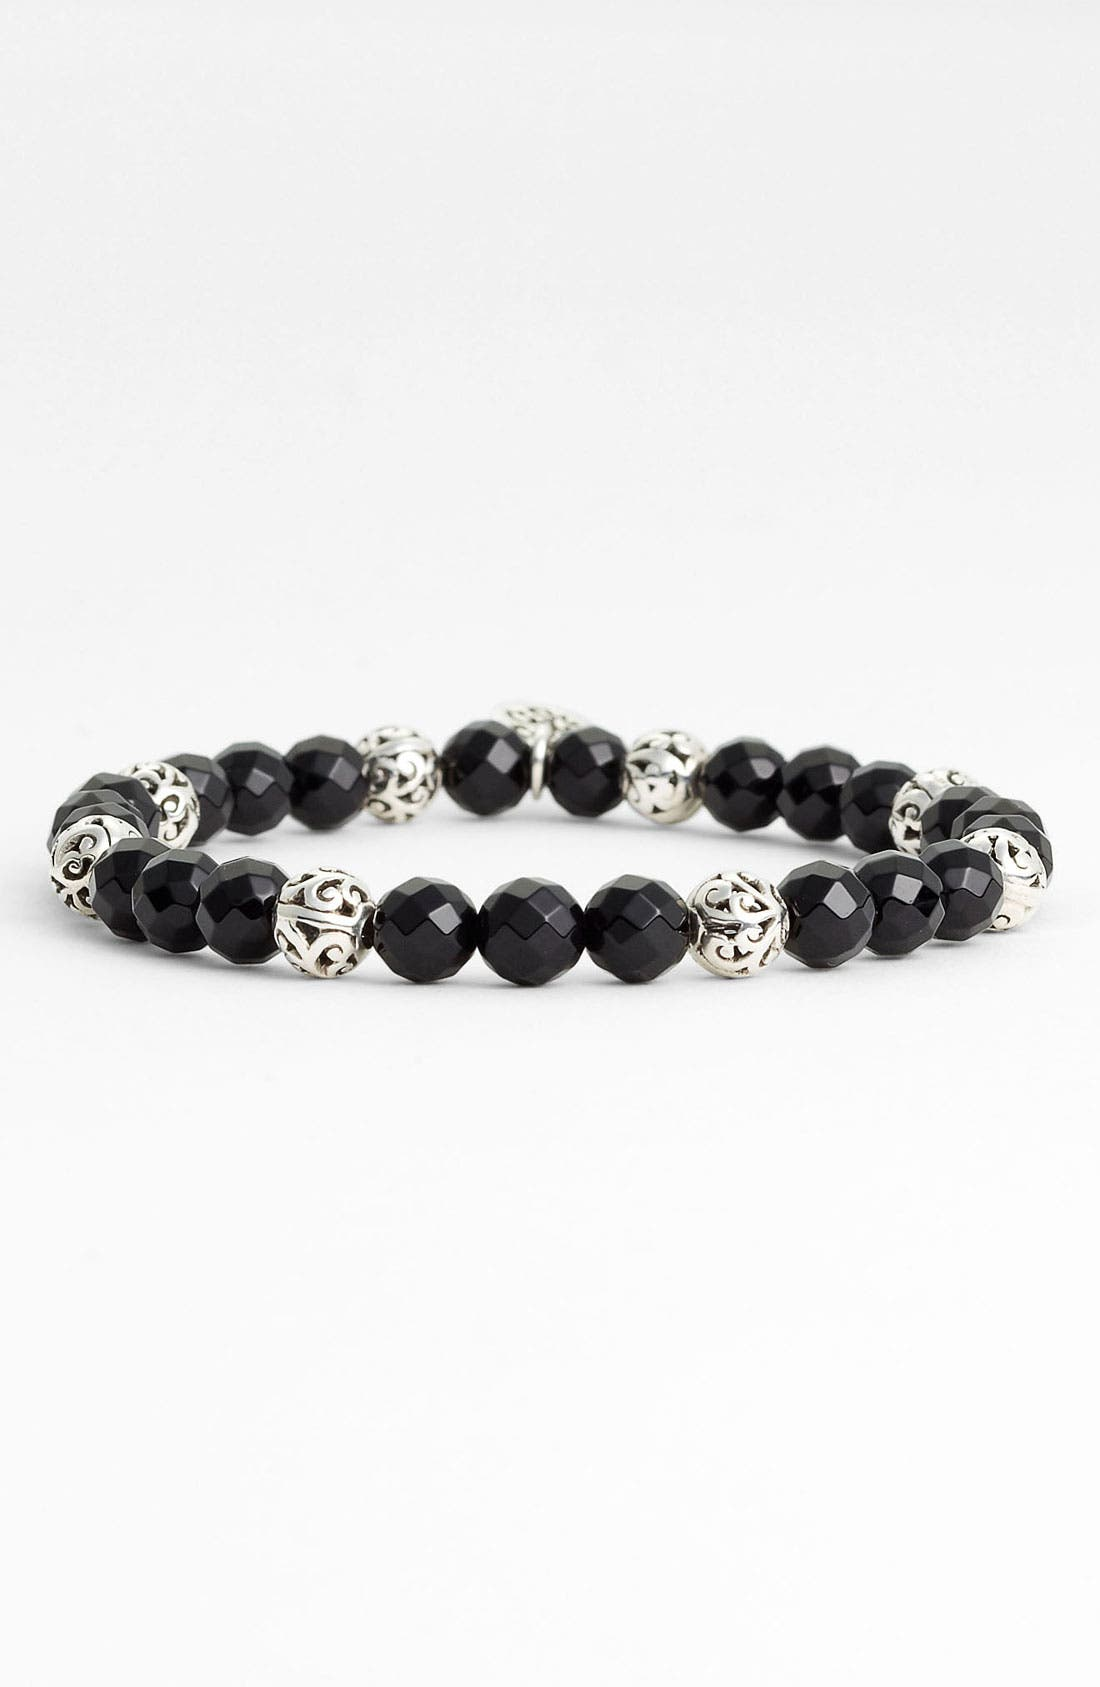 Main Image - Lois Hill Onyx & Silver Bead Stretch Bracelet